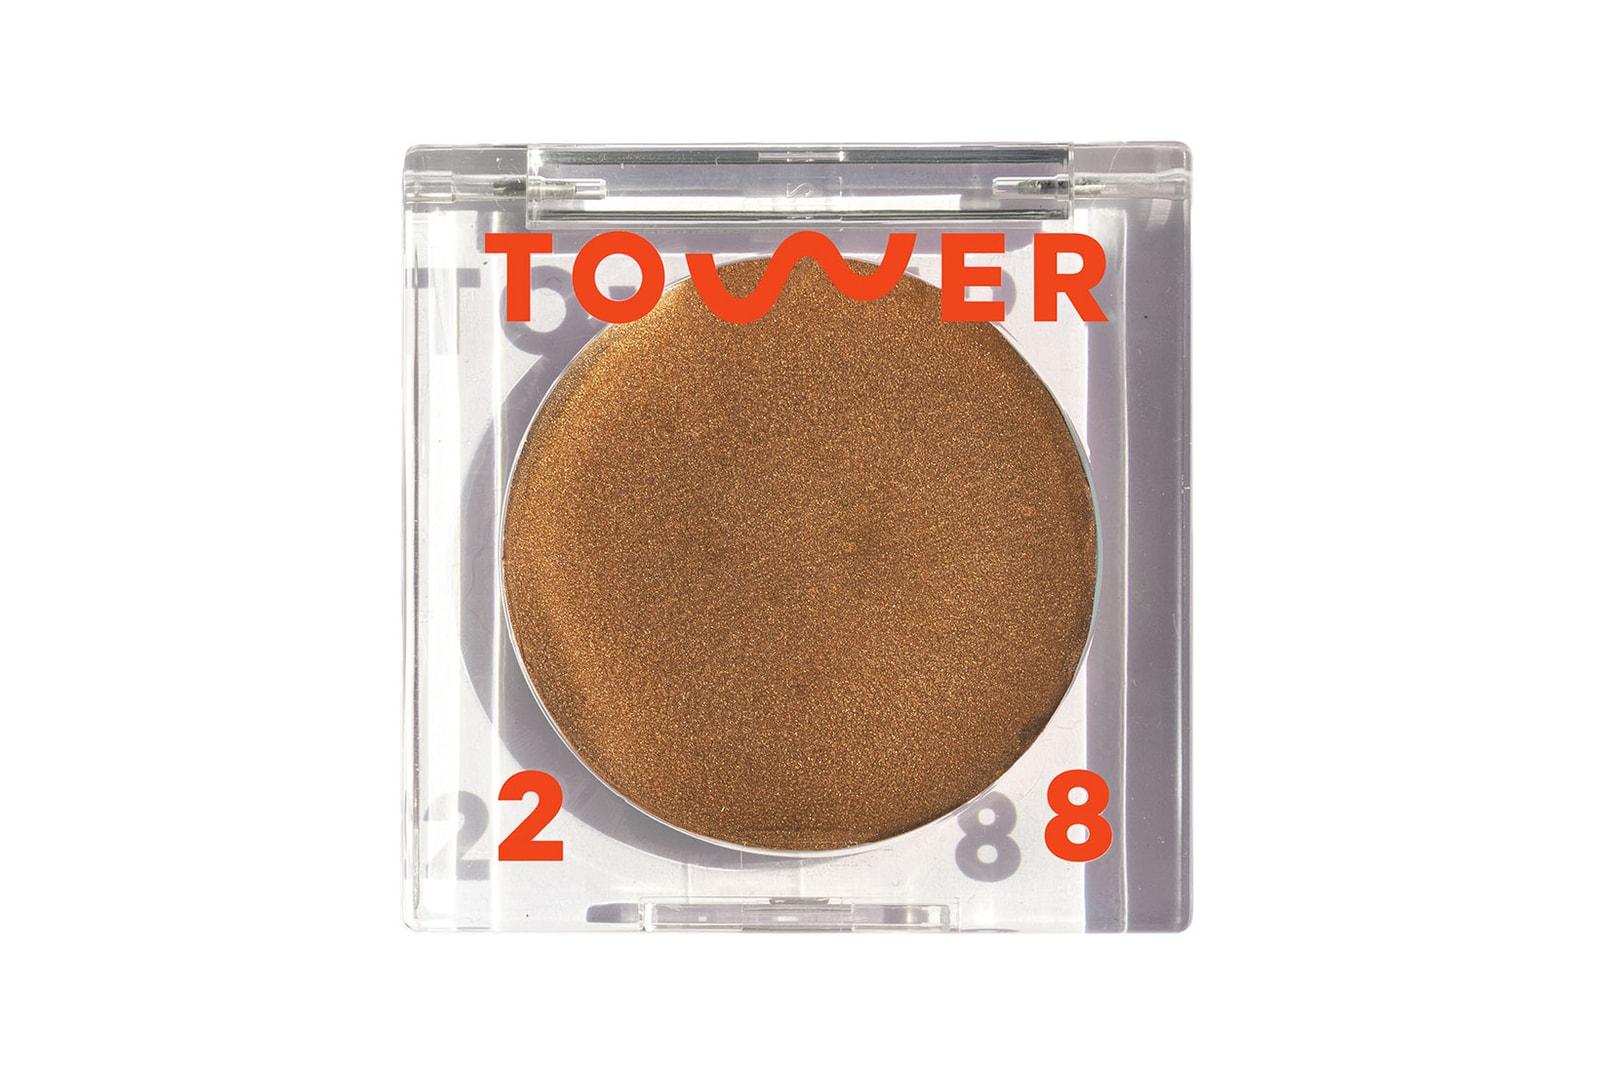 tower 28 Bronzino Illuminating Cream bronzer makeup new shades sun gold pacific coast clean beauty